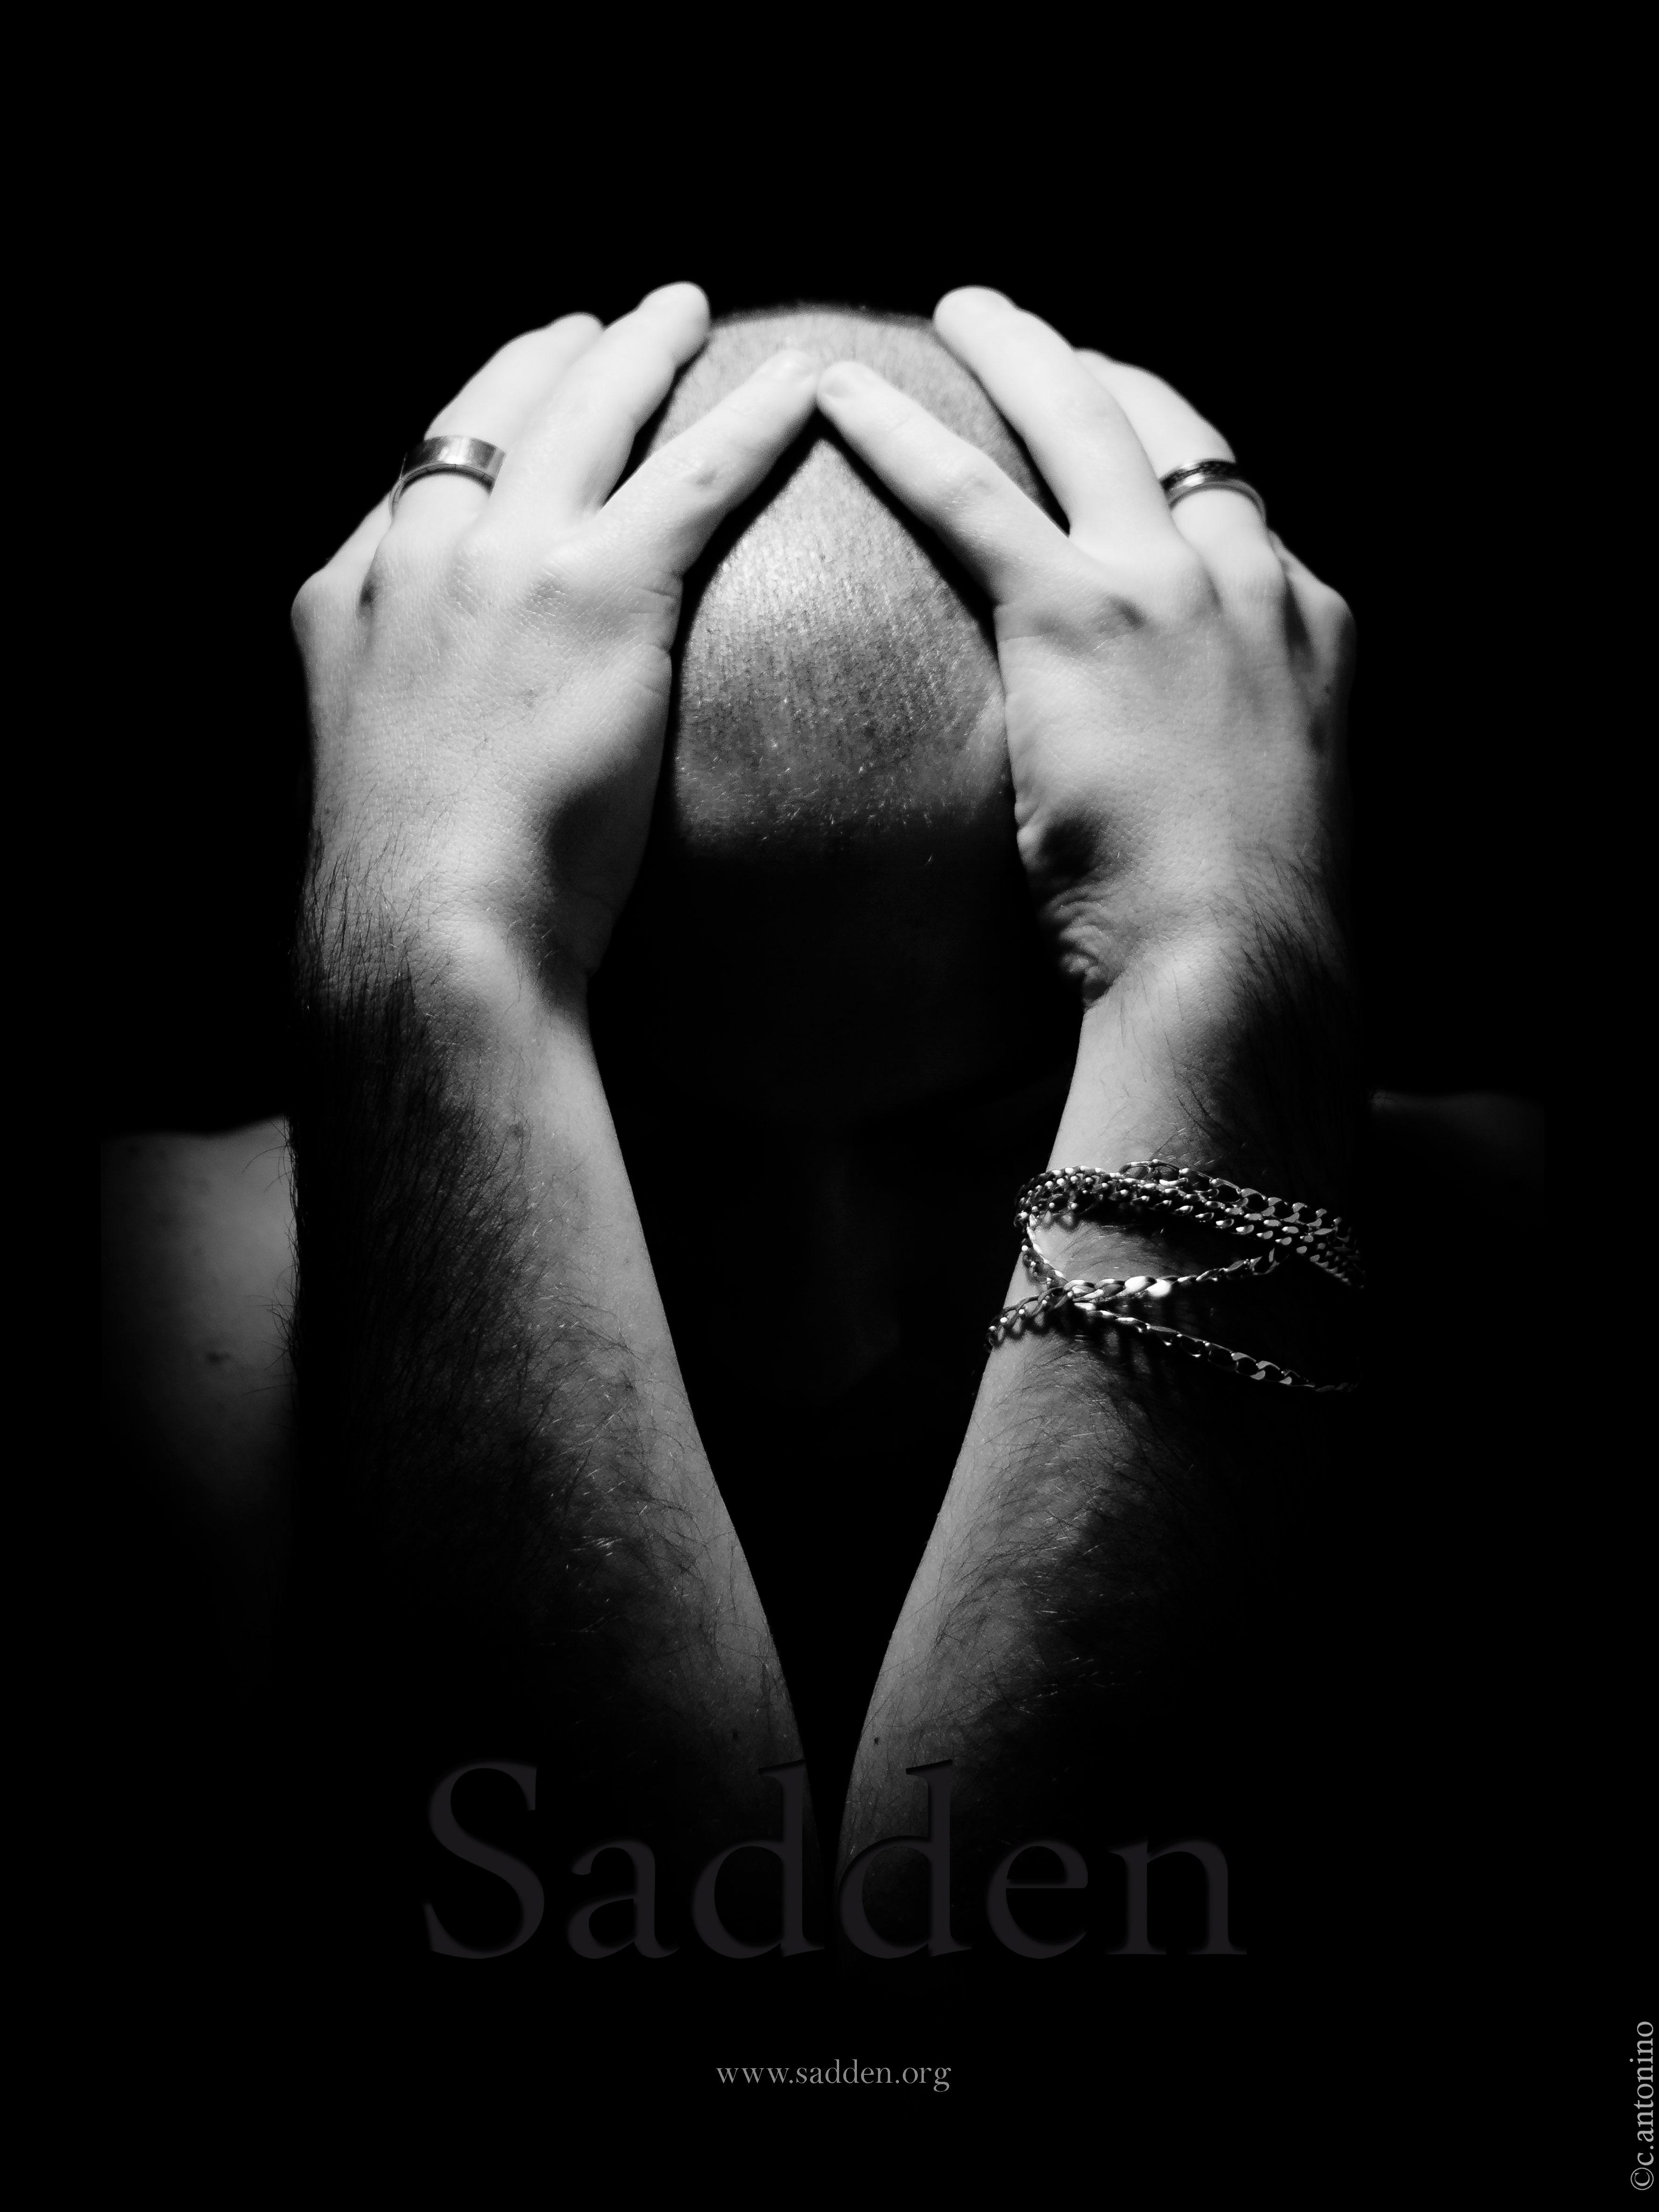 Sadden-